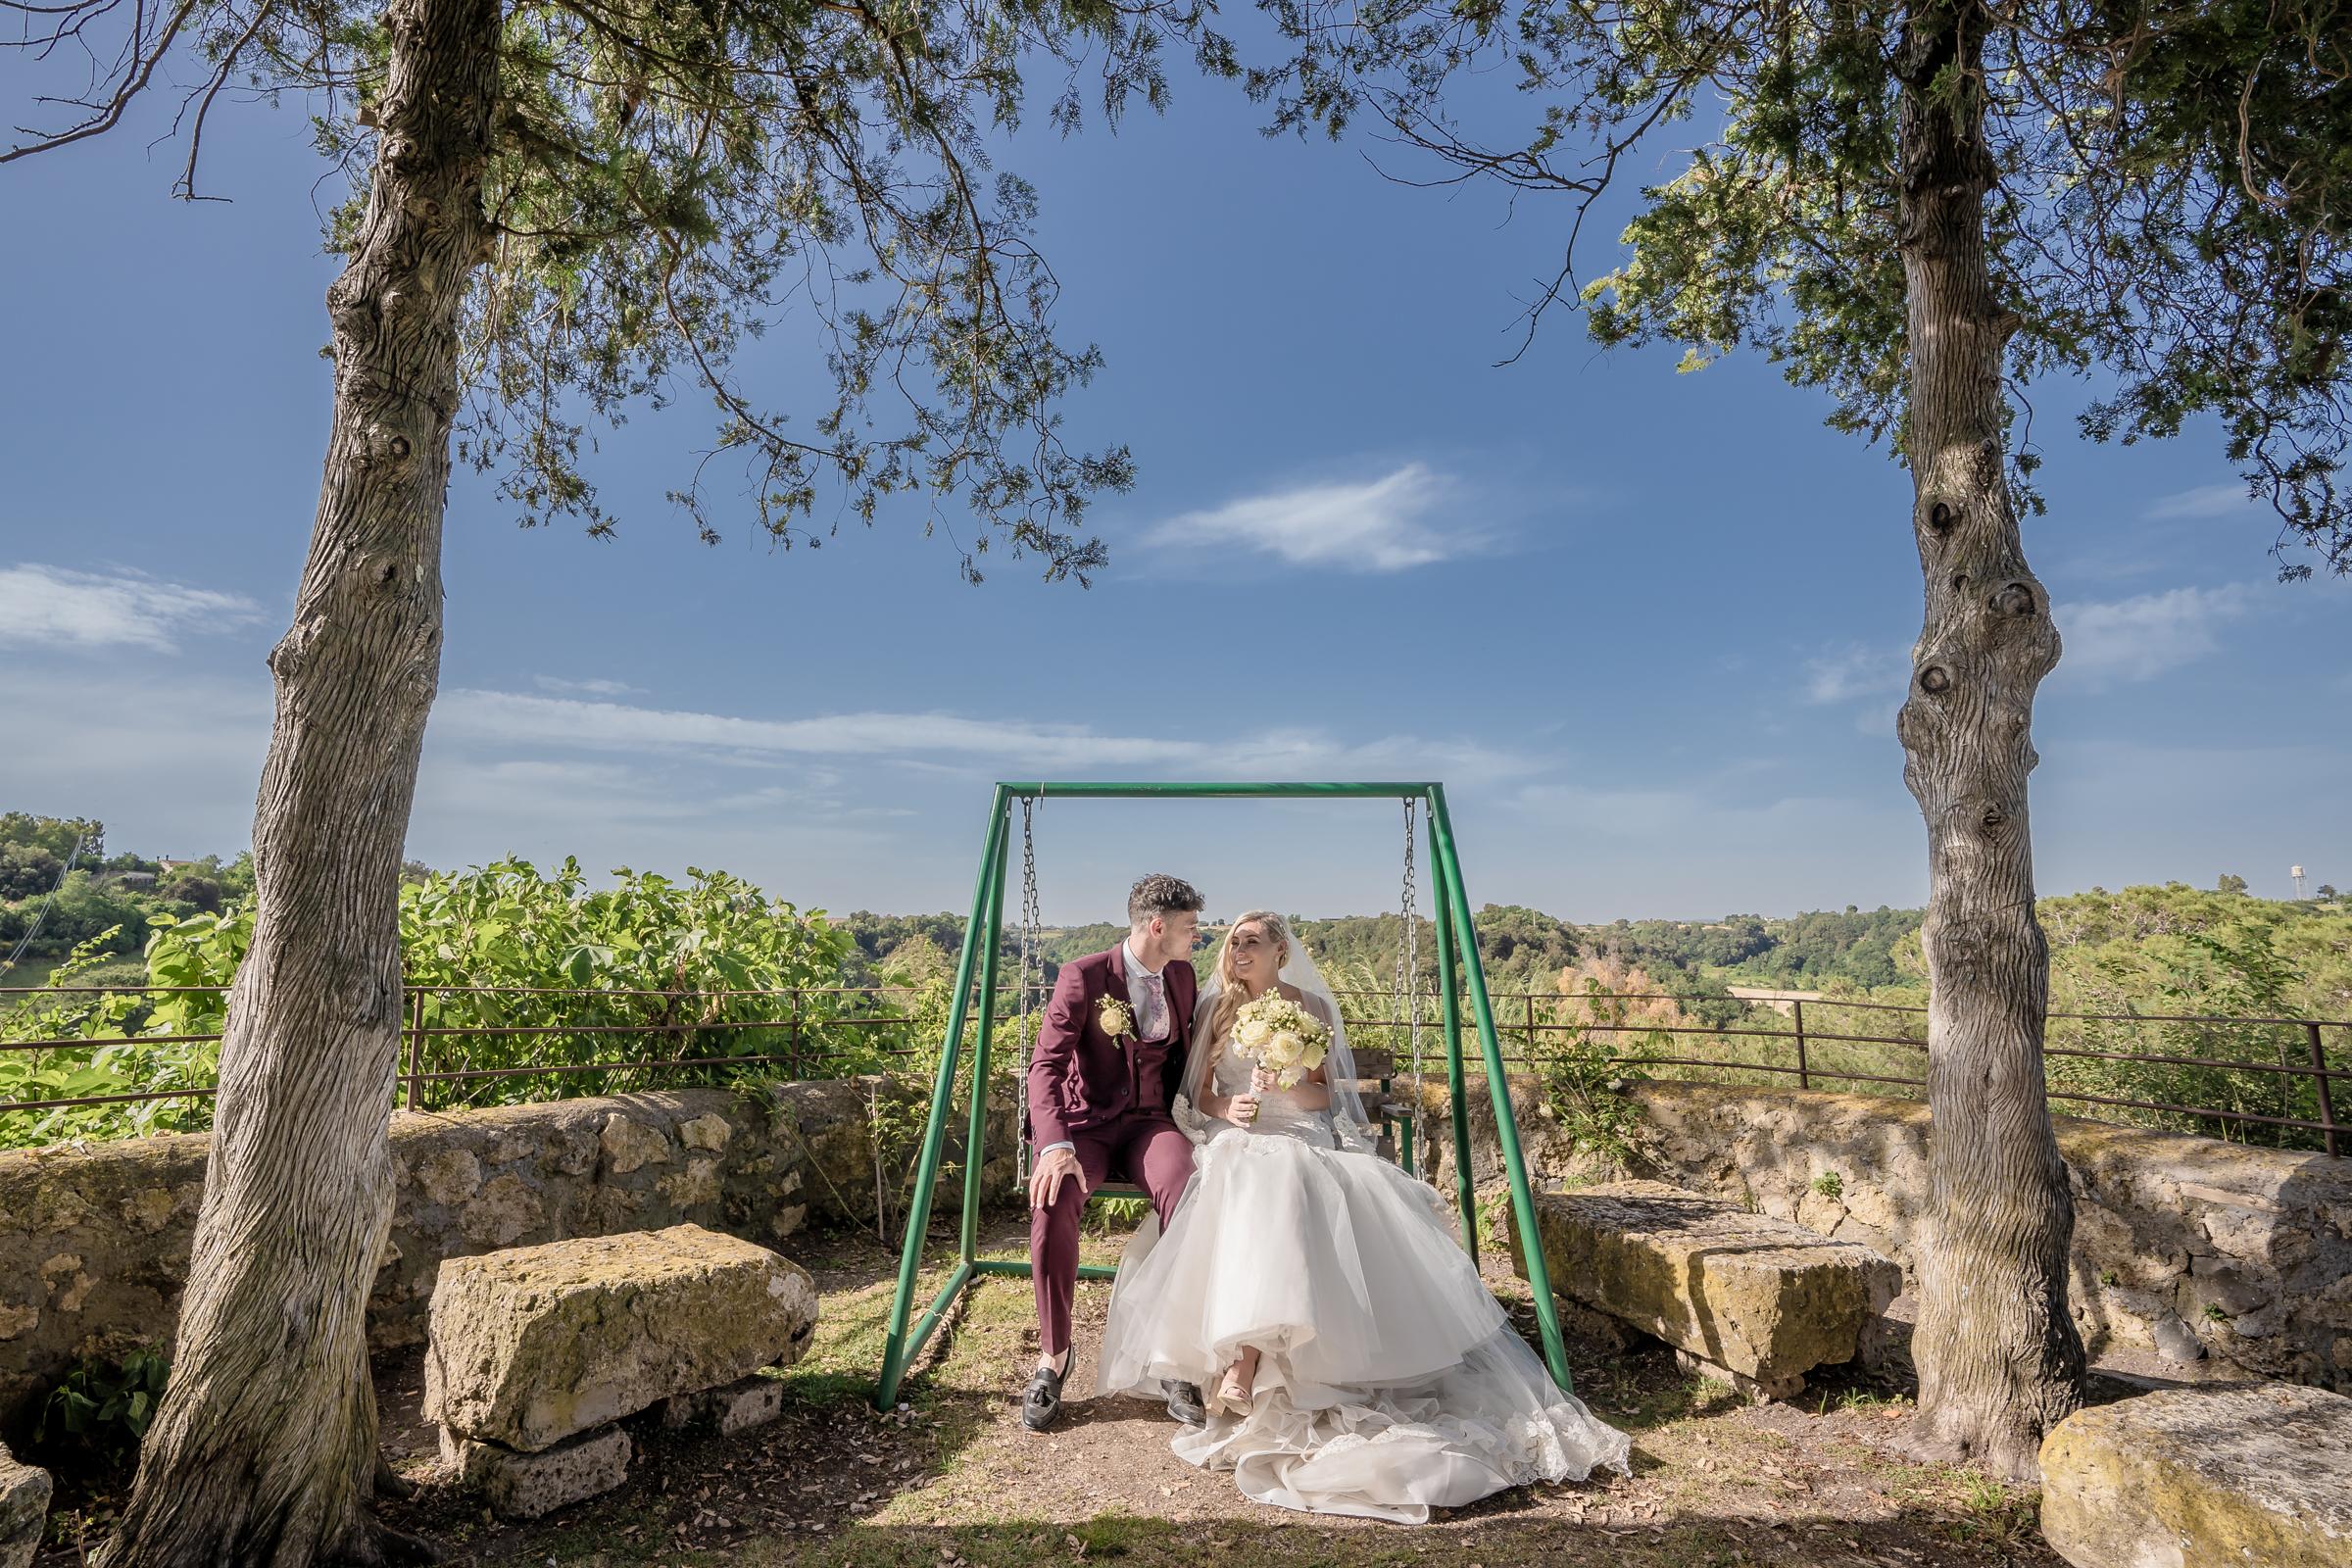 Borgo di tragliata Wedding-29.jpg